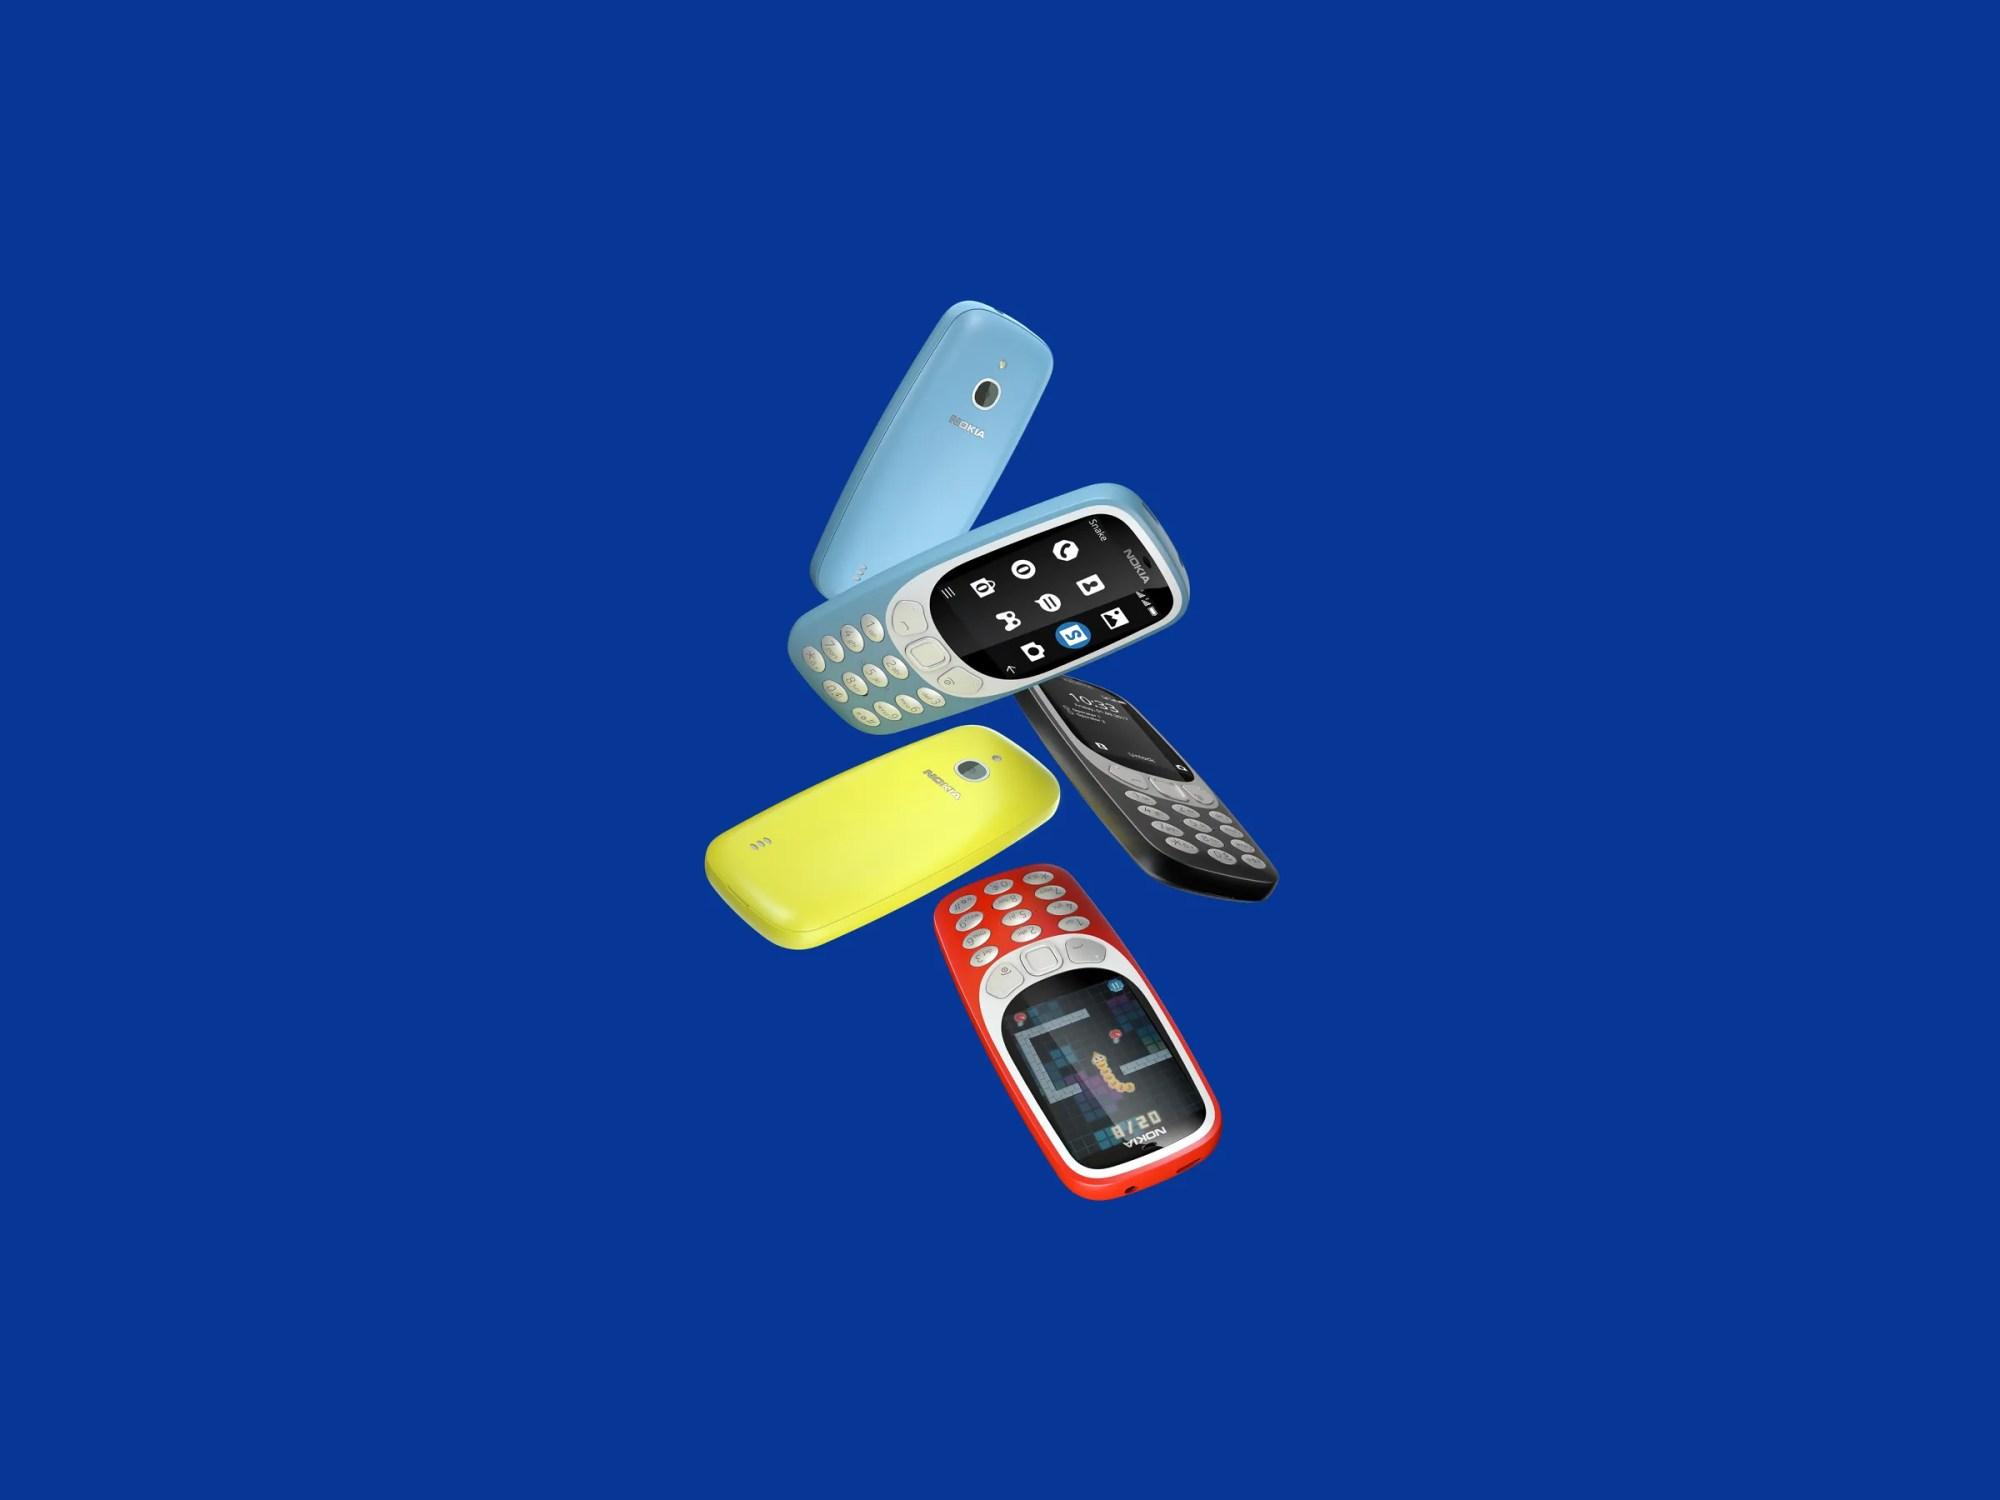 hight resolution of inside nokia s super fun feature phone nostalgia trip